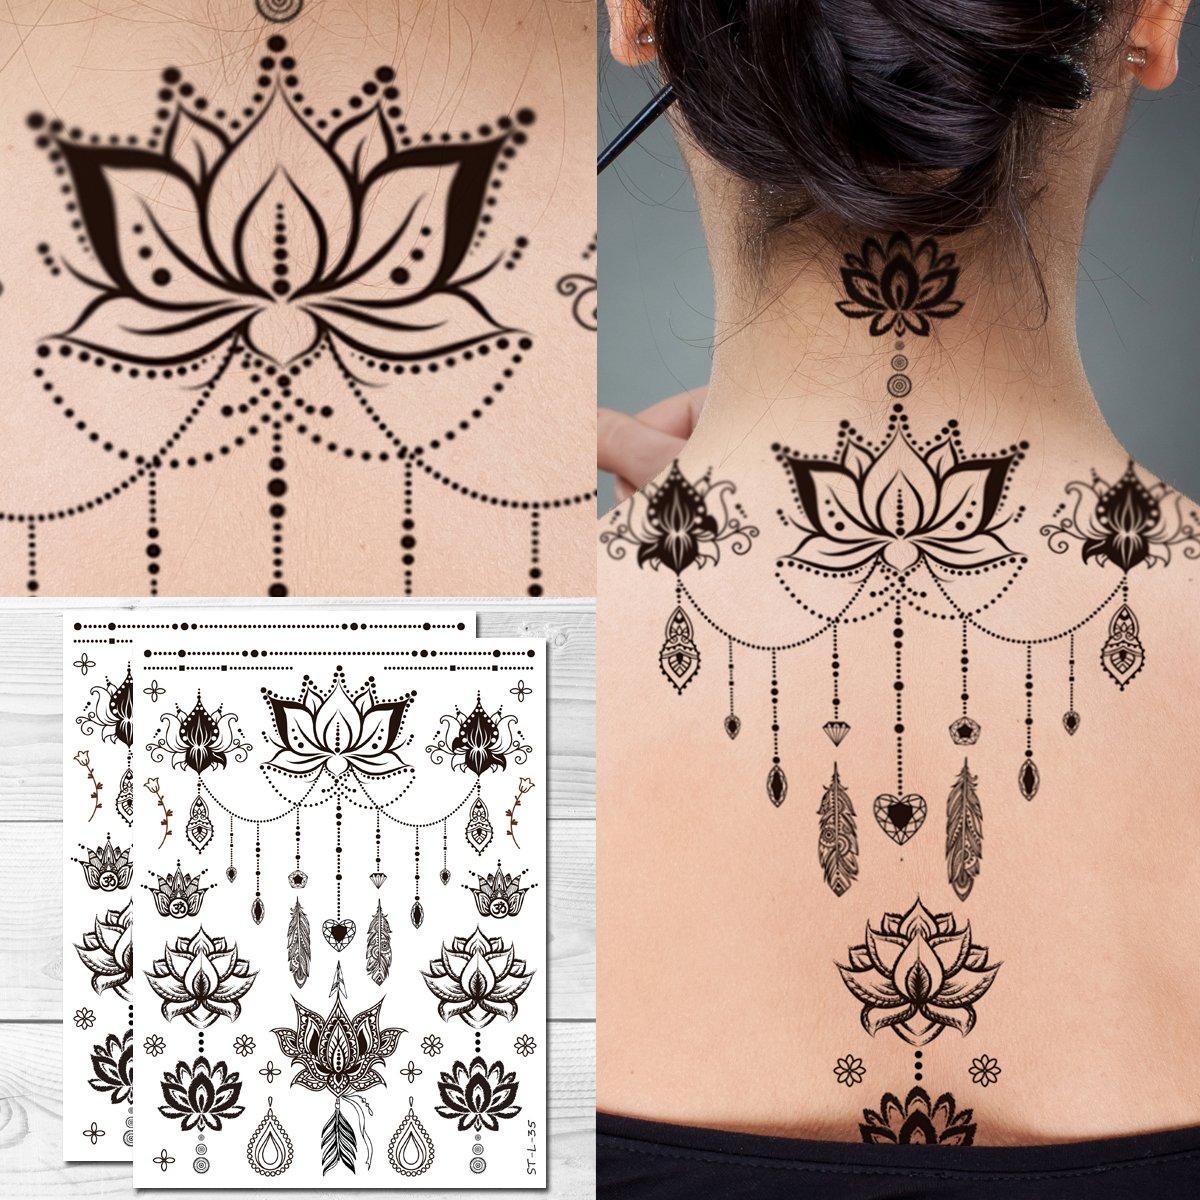 Amazon Com Supperb Temporary Tattoos Mandala Floral Lotus